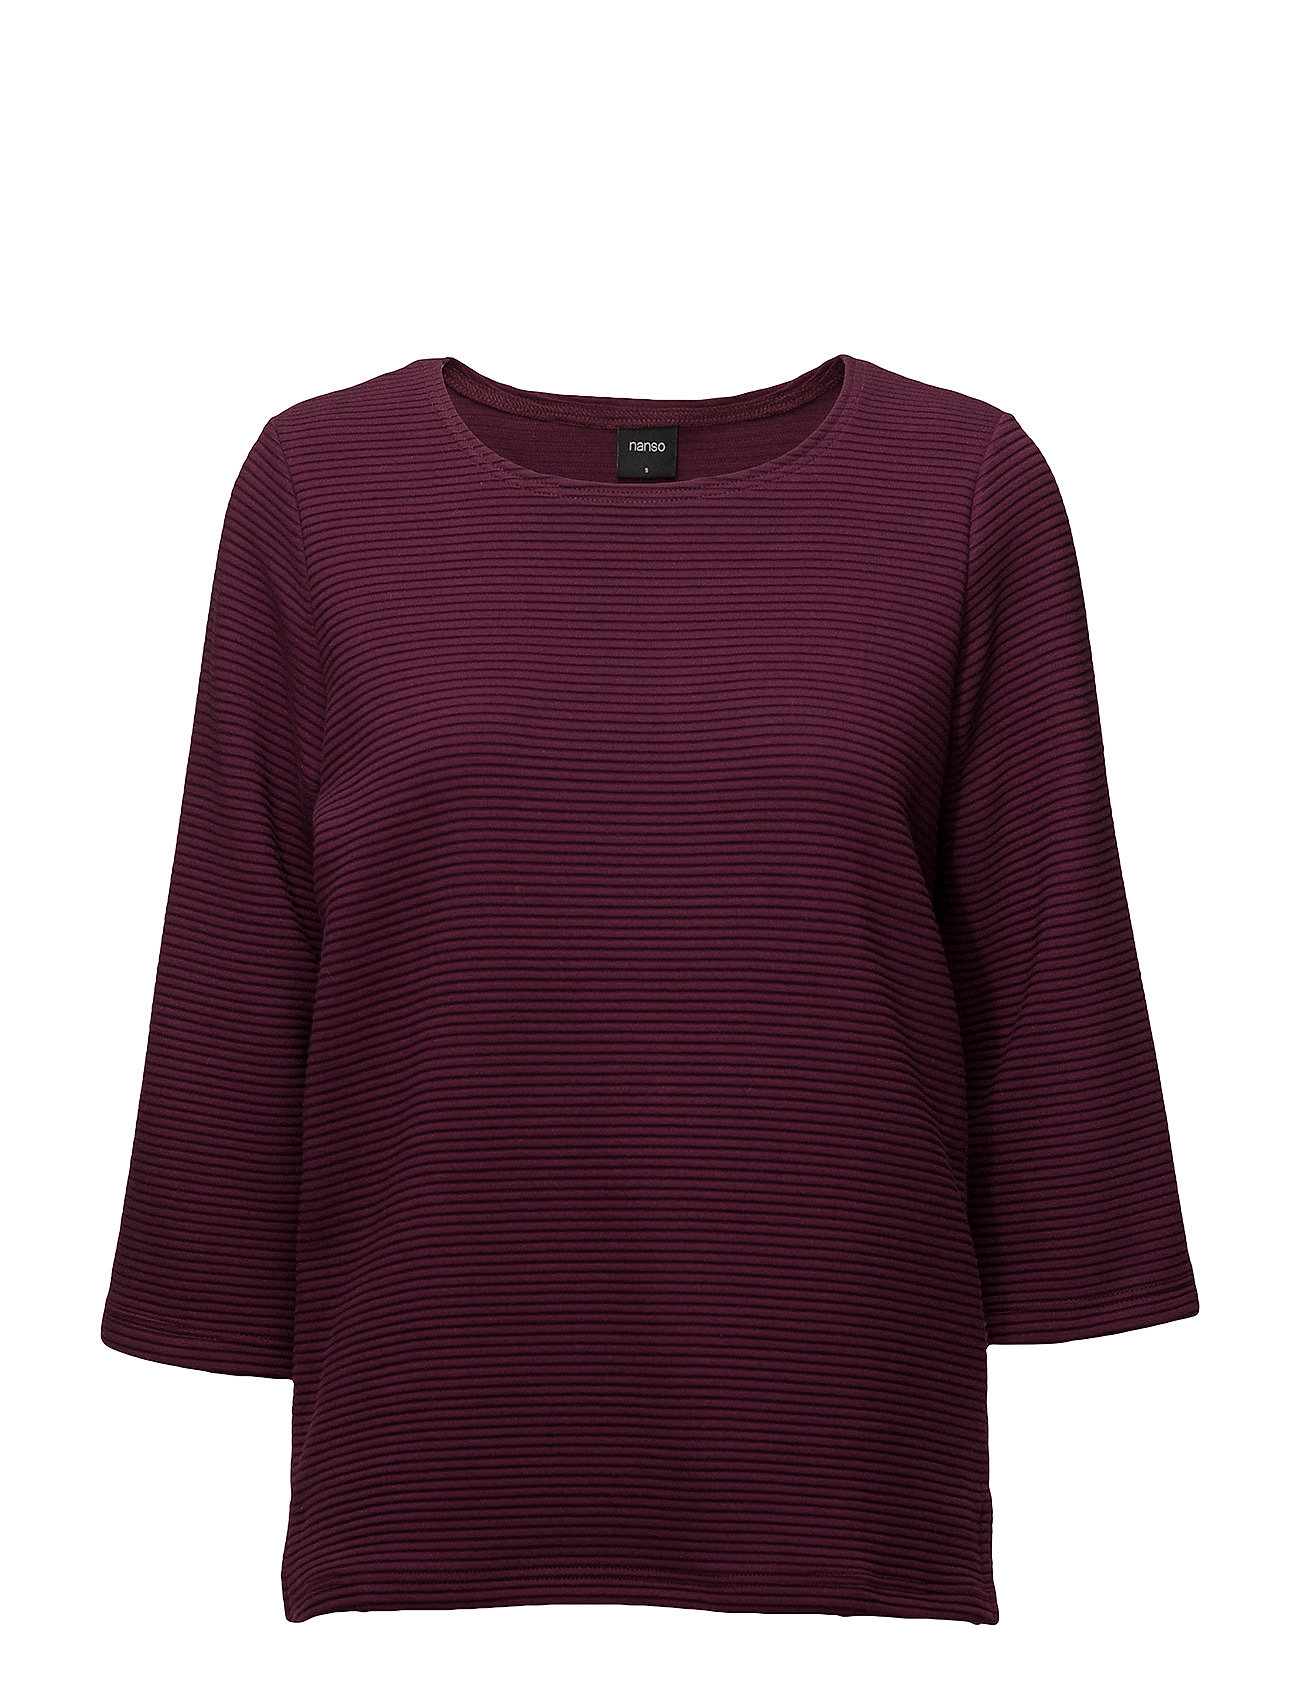 nanso Ladies shirt, selja på boozt.com dk